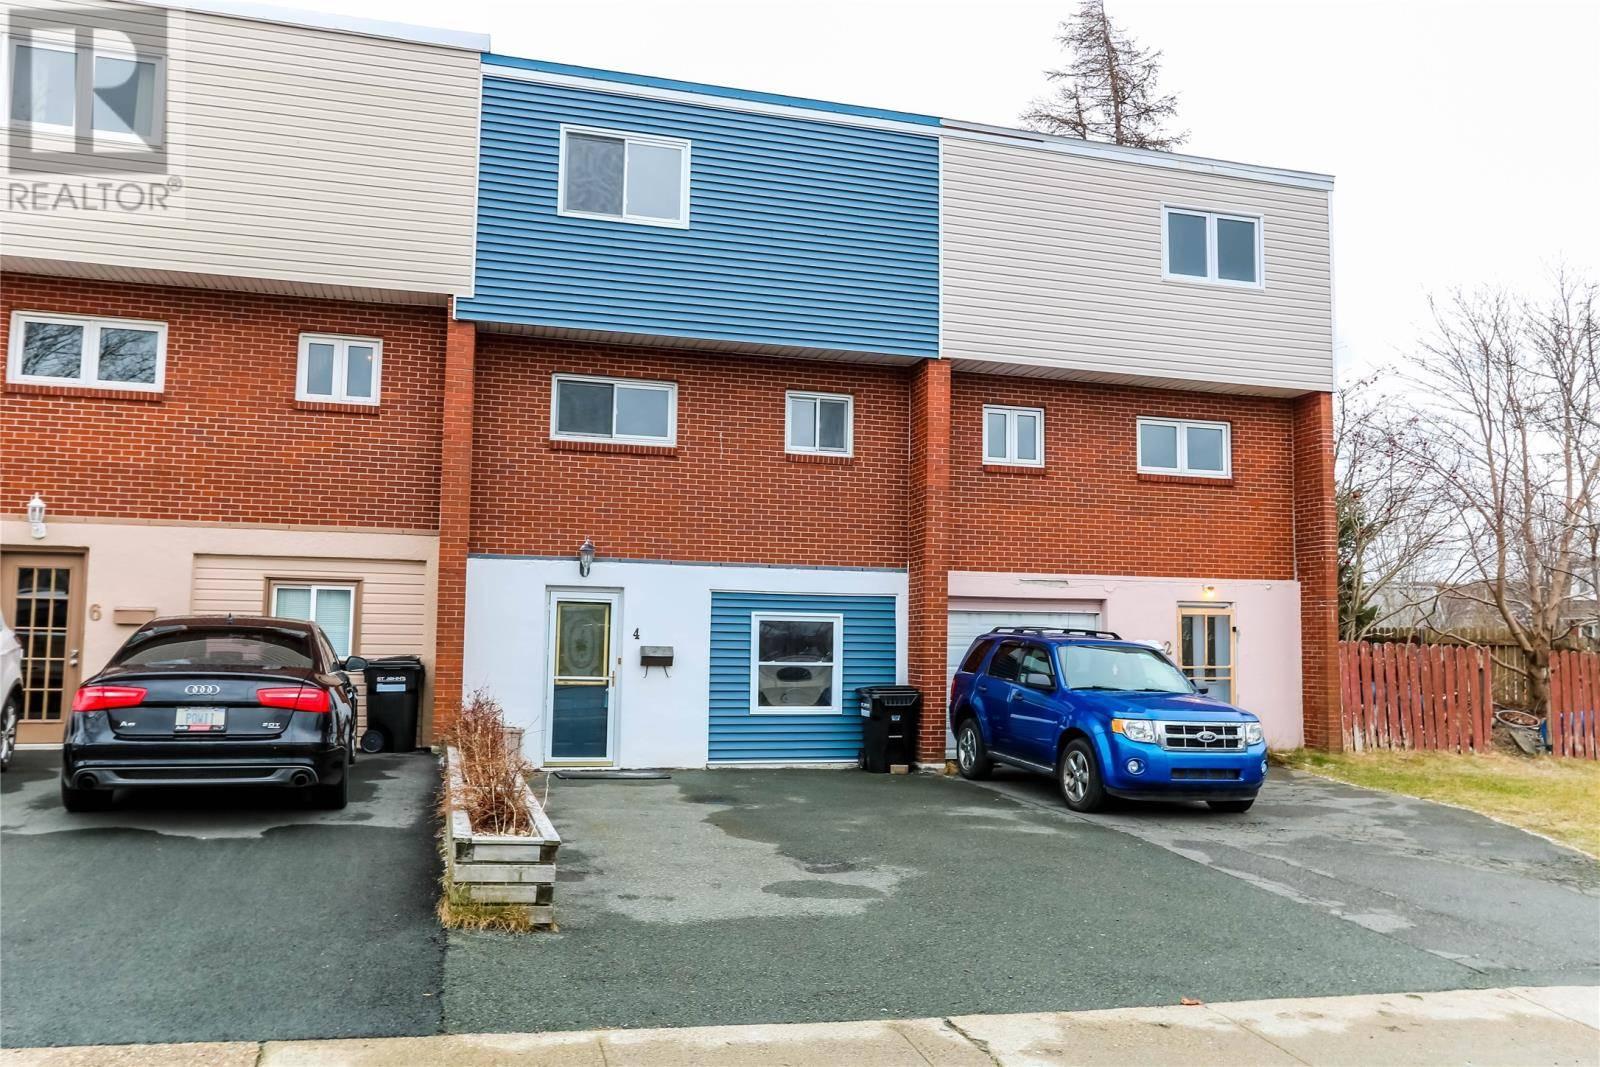 House for sale at 4 Steer St St. John's Newfoundland - MLS: 1209007